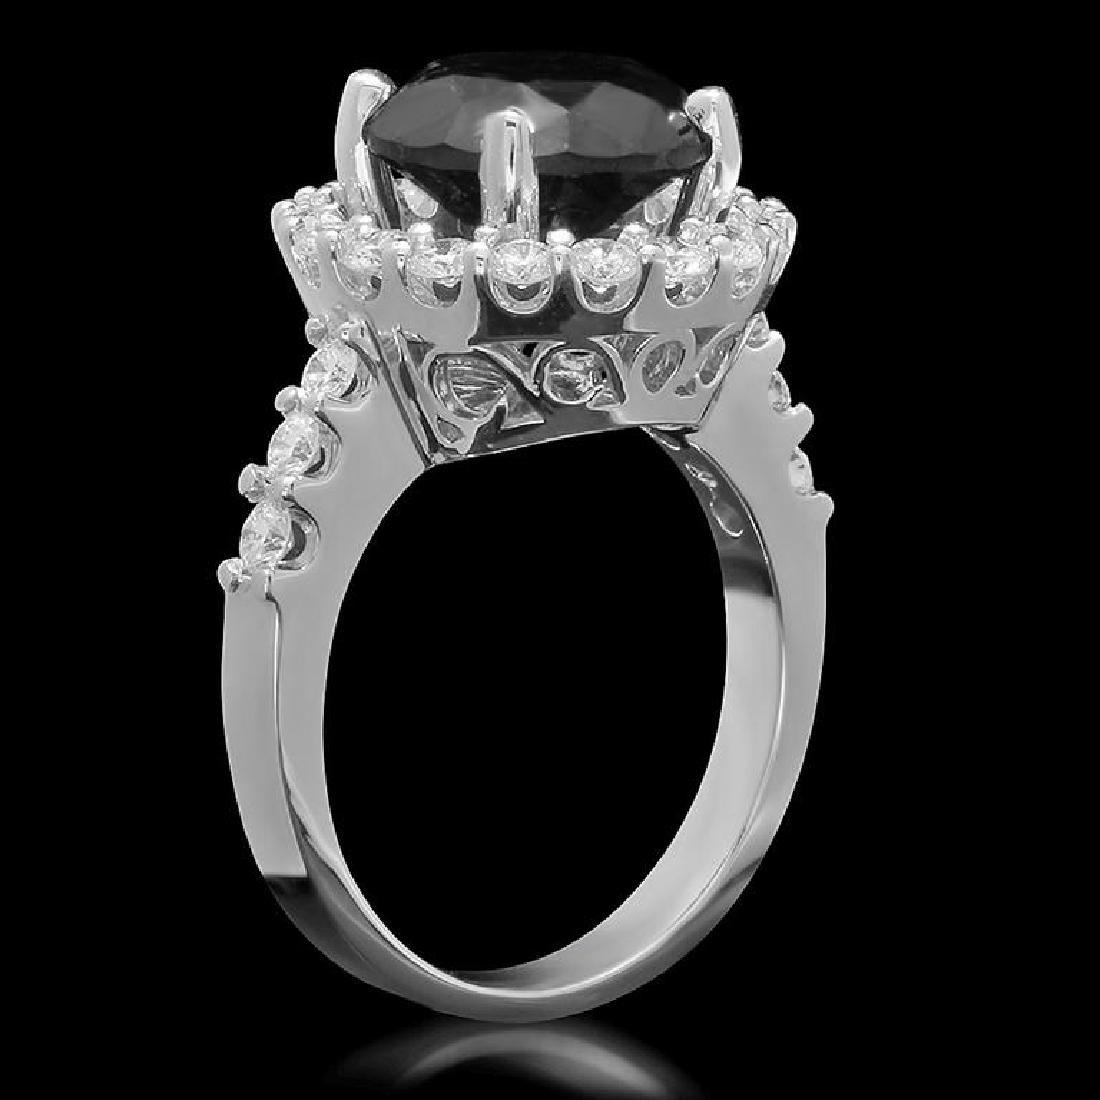 14K Gold 4.35ct Fancy Color Diamond 3.35ct Diamond Ring - 2